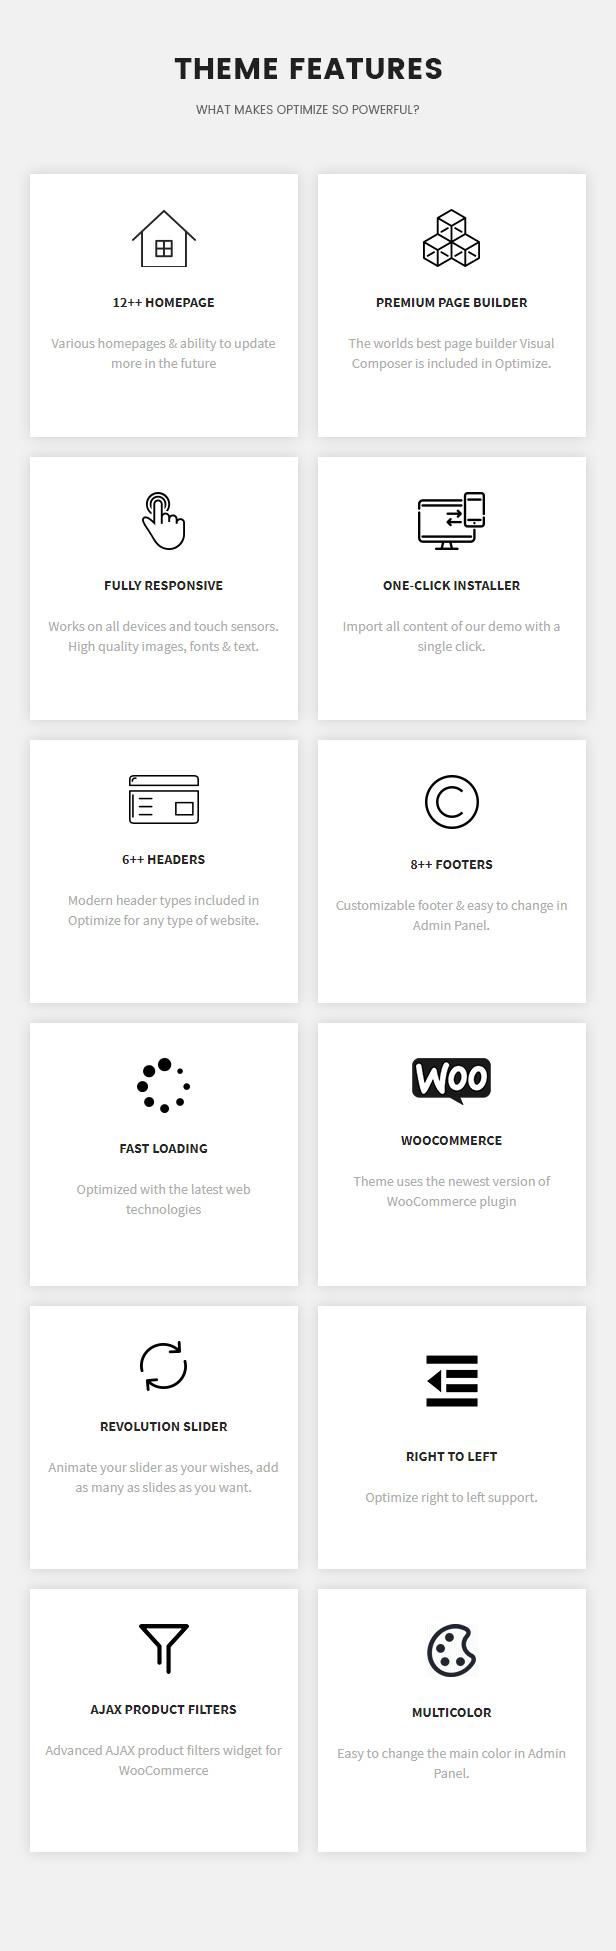 Oritina - Minimal WooCommerce Theme For Furniture, Decor, Interior - 3